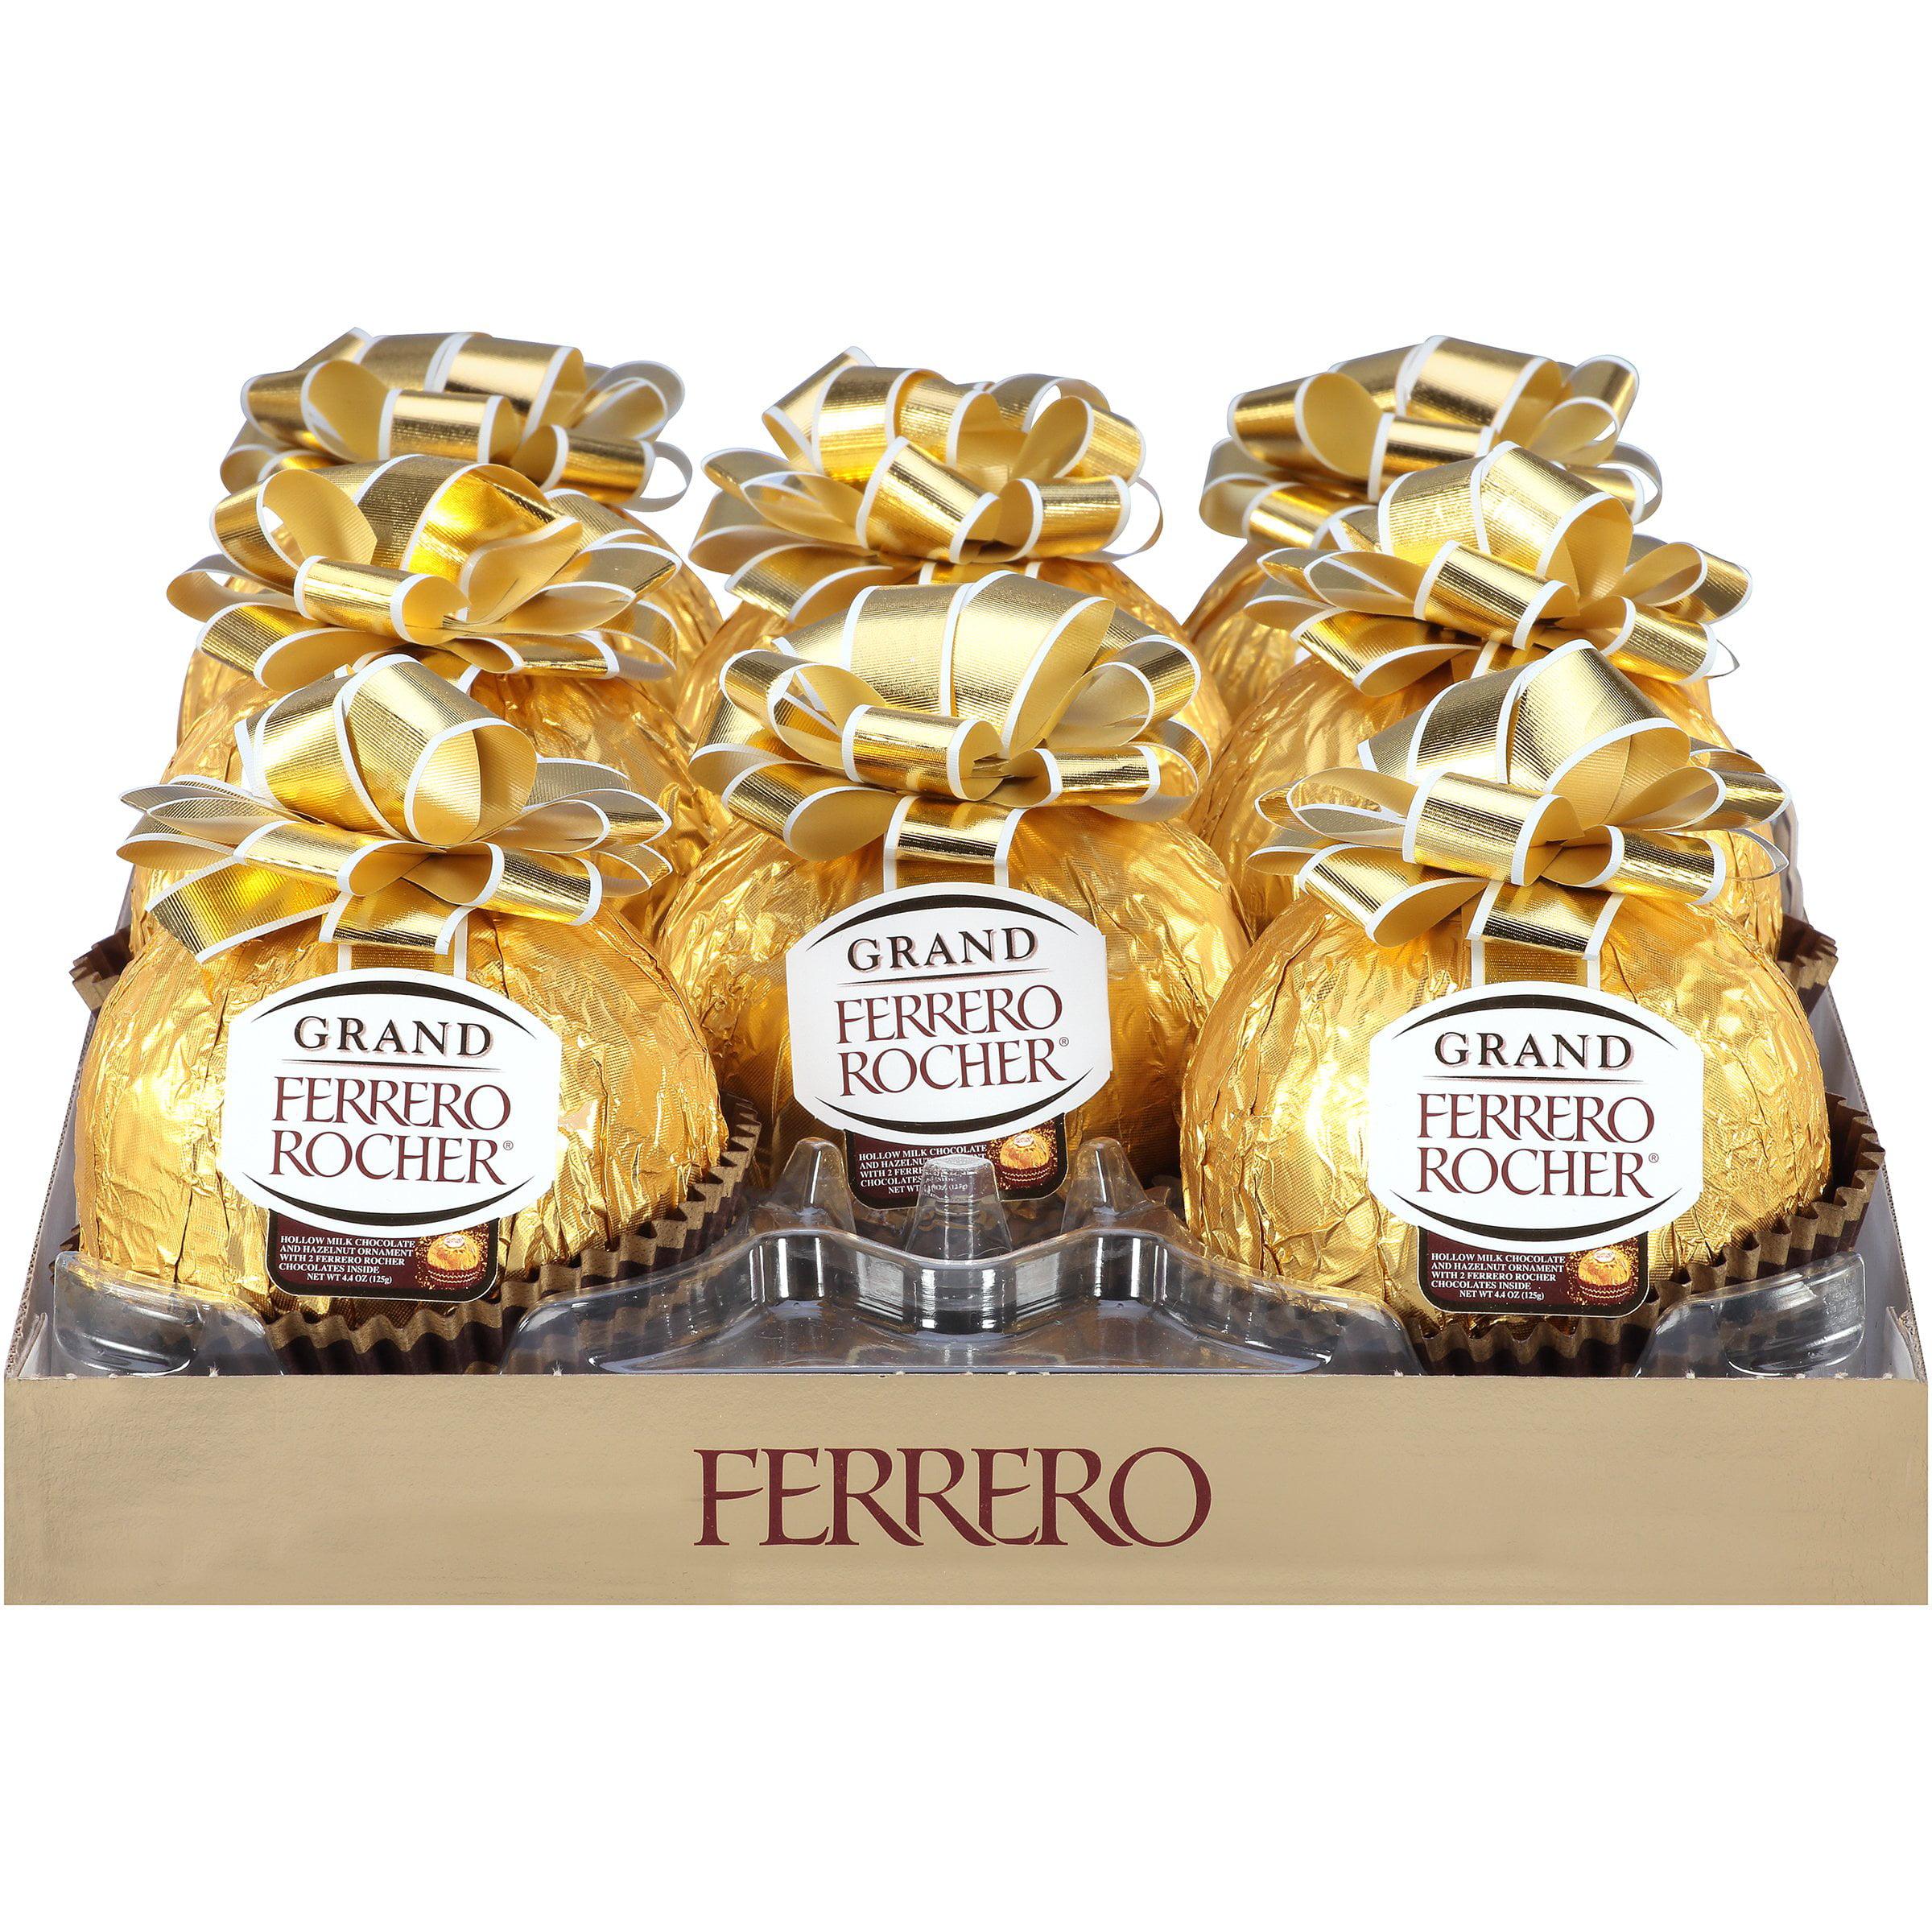 Grand Ferrero Rocher® Milk Chocolate and Hazelnut Ornament 4.4 oz ...